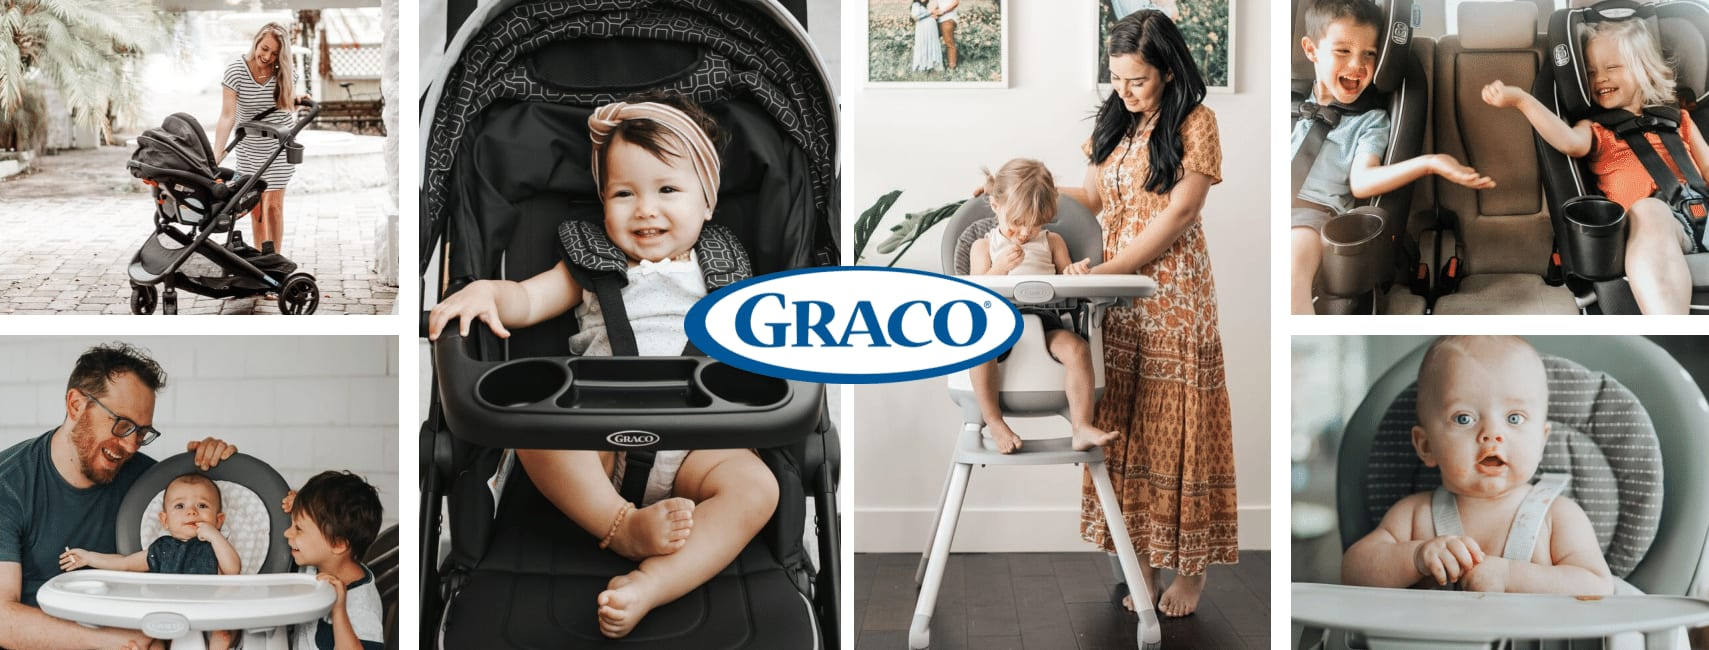 Graco banner